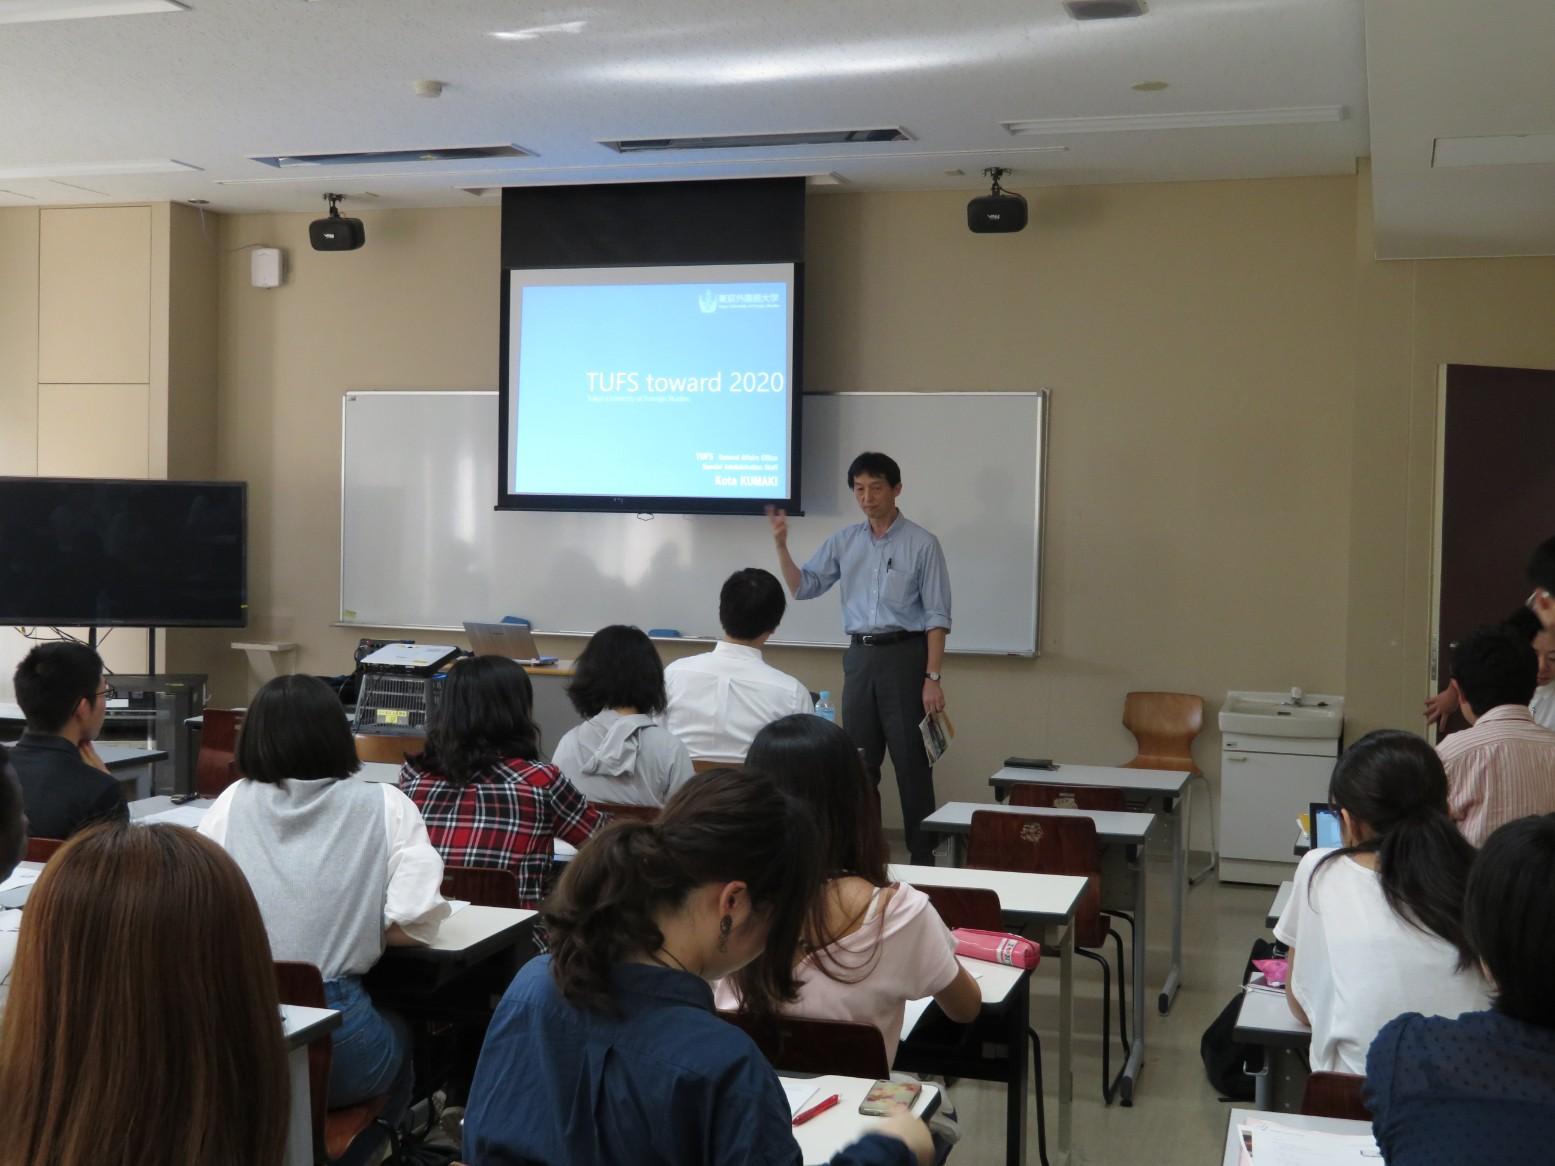 【The 17th ASC Seminar】ASC - TIAS Joint Seminar: Toward Tokyo 2020 Olympic Paralympic Games